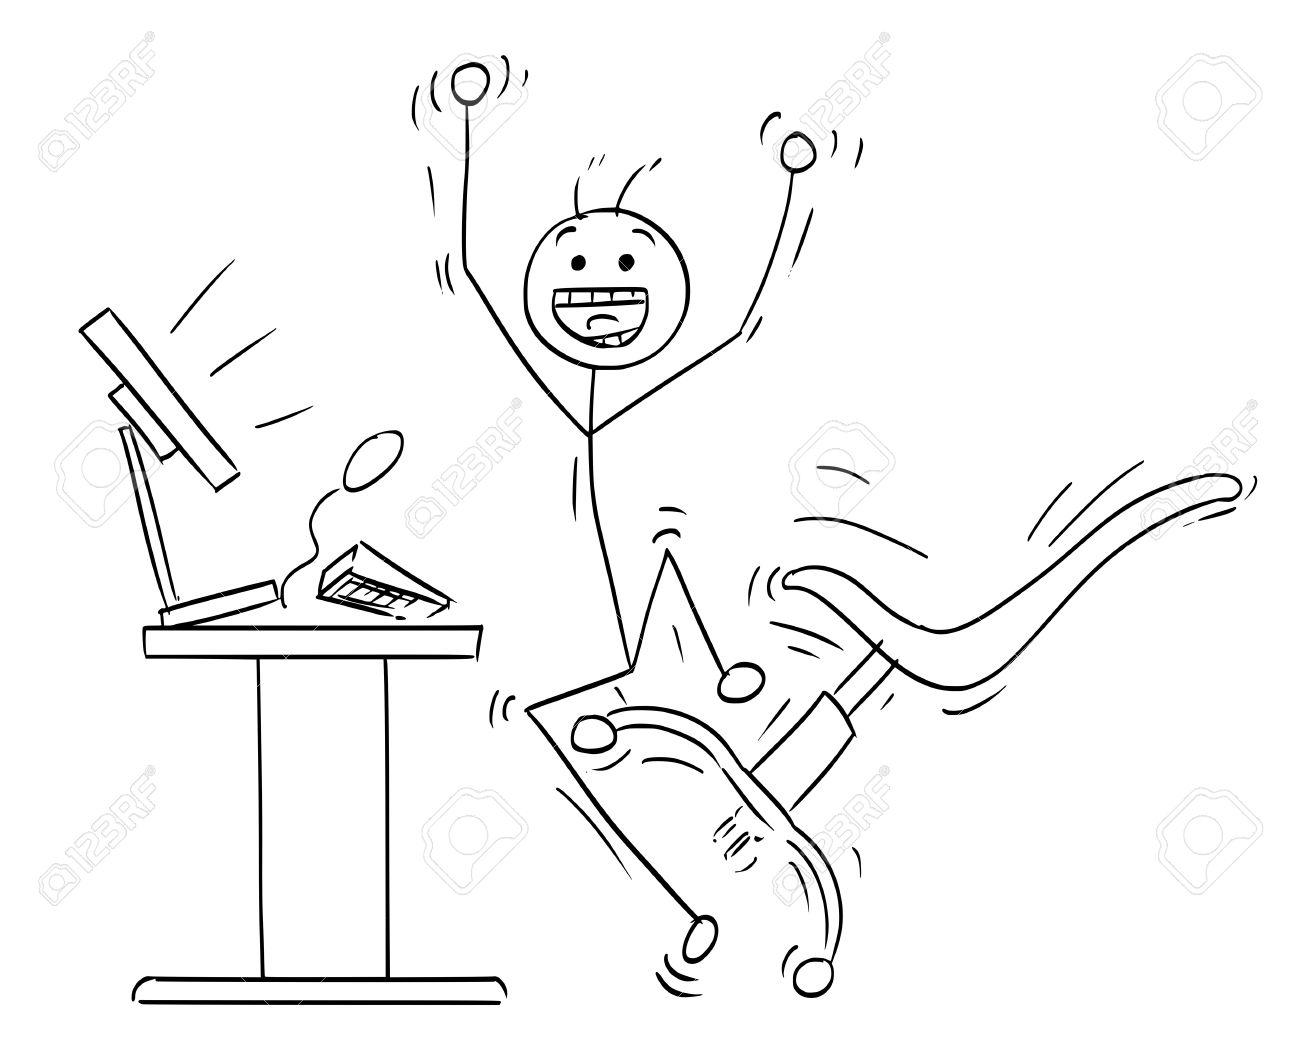 1300x1061 Cartoon Vector Stick Man Stickman Drawing Of Happy Man Jumping